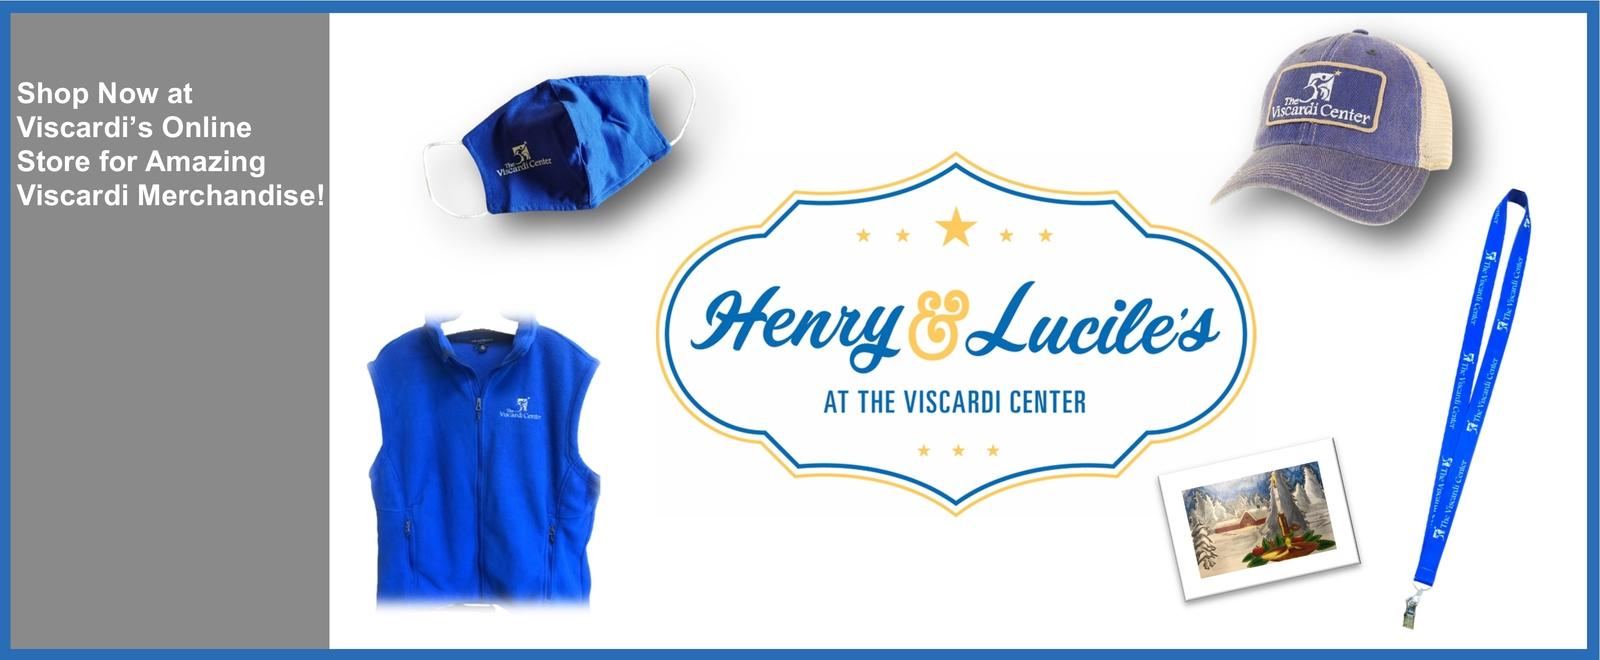 Shop Now at Viscardi's Online Store for amazing Viscardi merchandise!